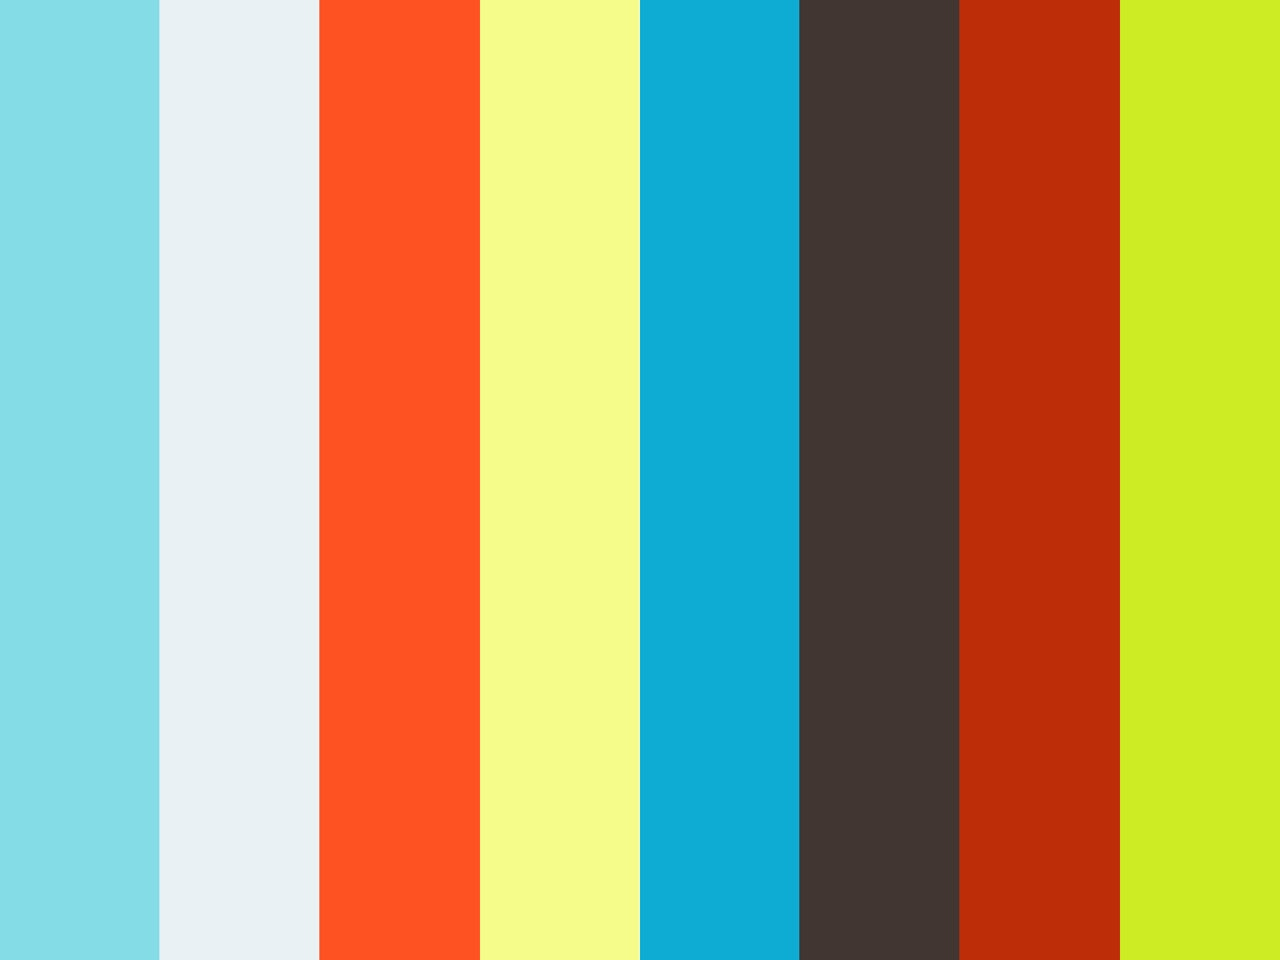 Molokai Covid19 Update - Thursday, April 30, 2020